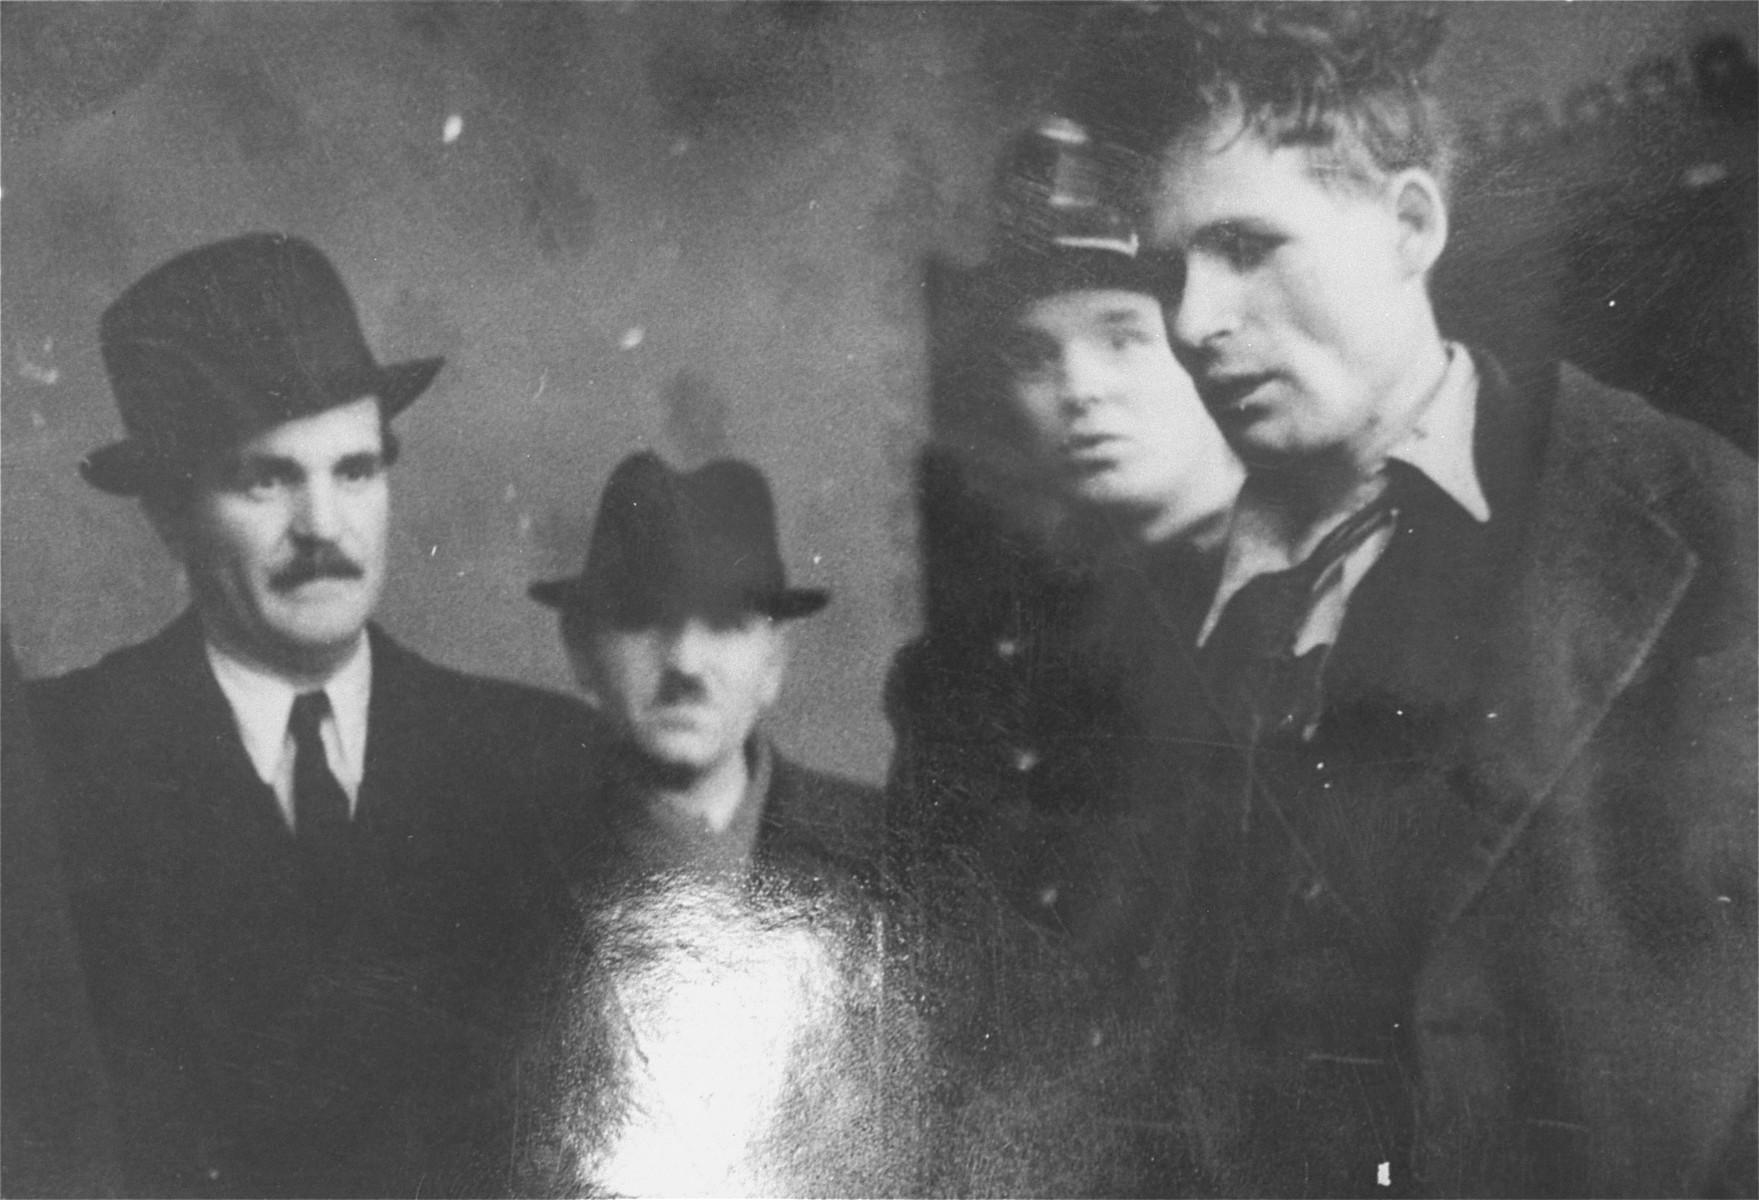 Hungarian police arrest Jewish resister, Robert Mandel, in Budapest.